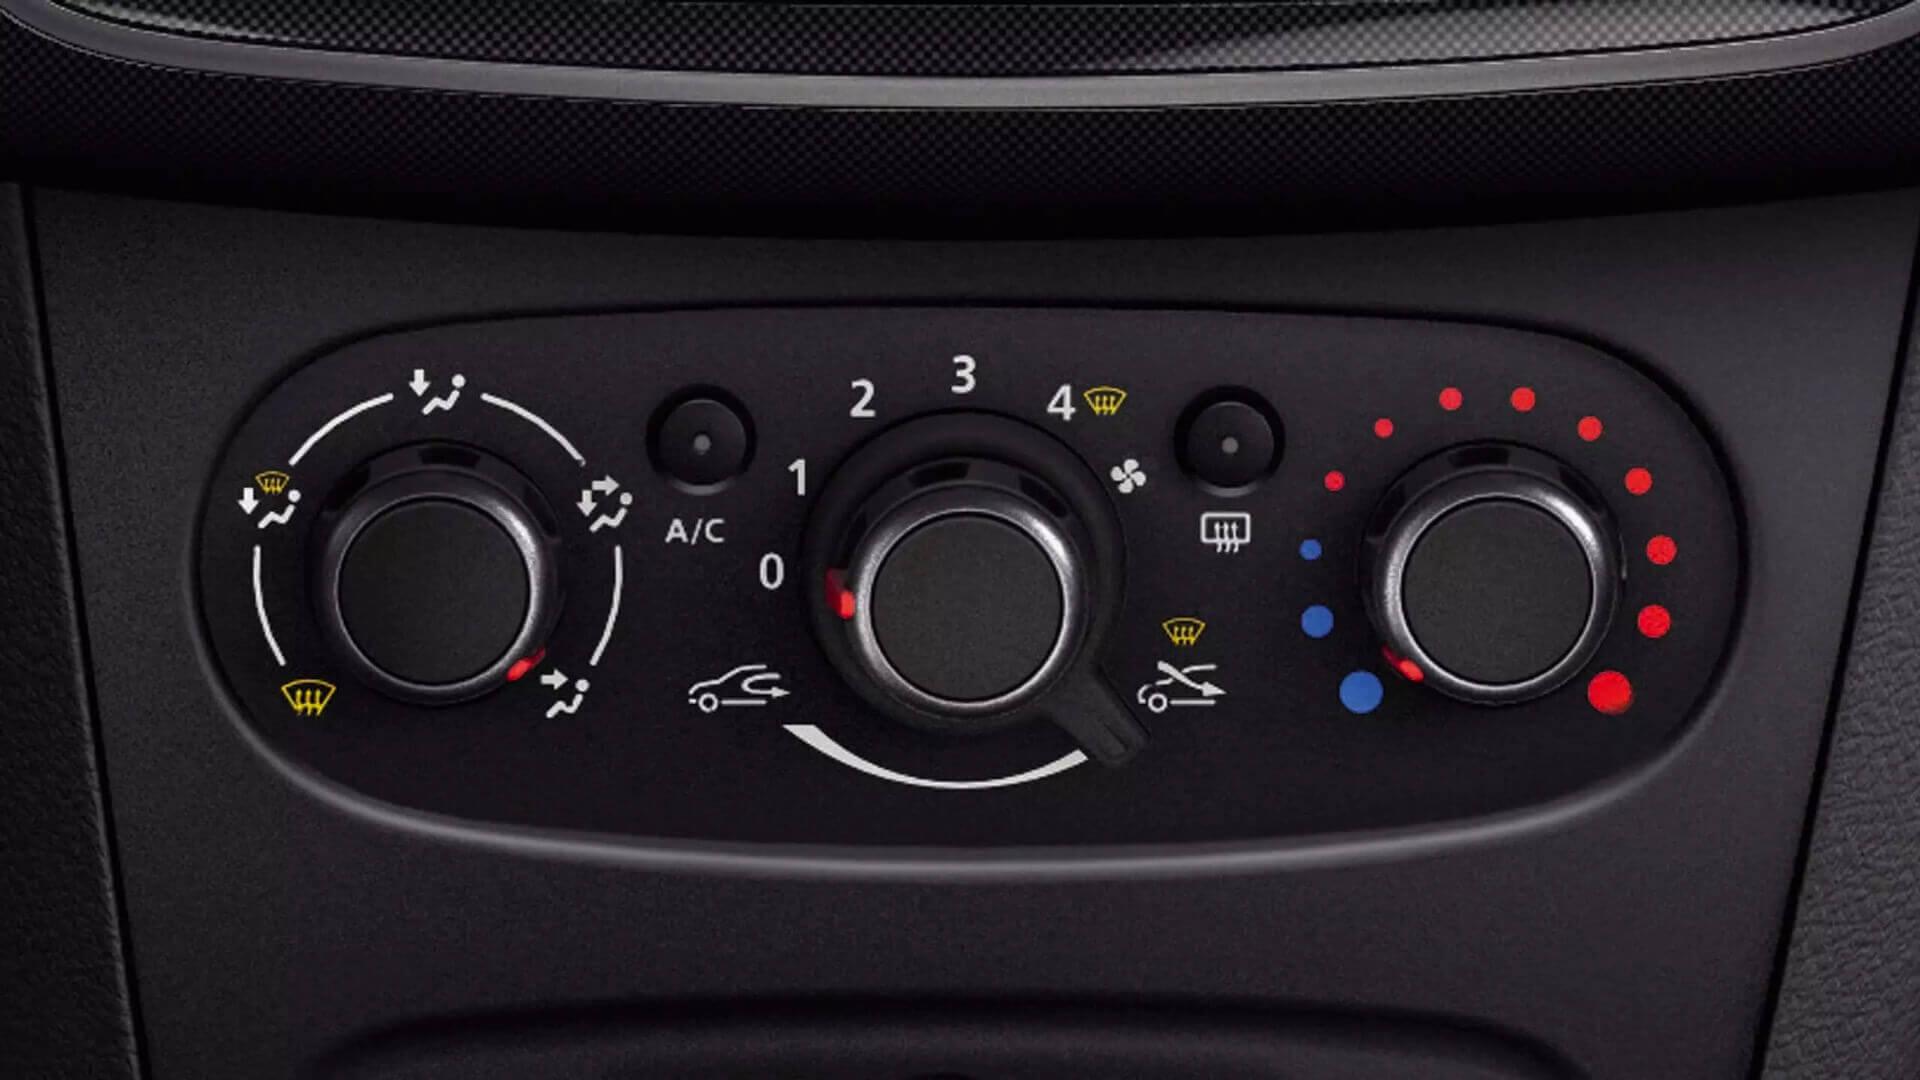 Klimasteuerung vom Auto - Dacia Lodgy - Renault Ahrens Hannover